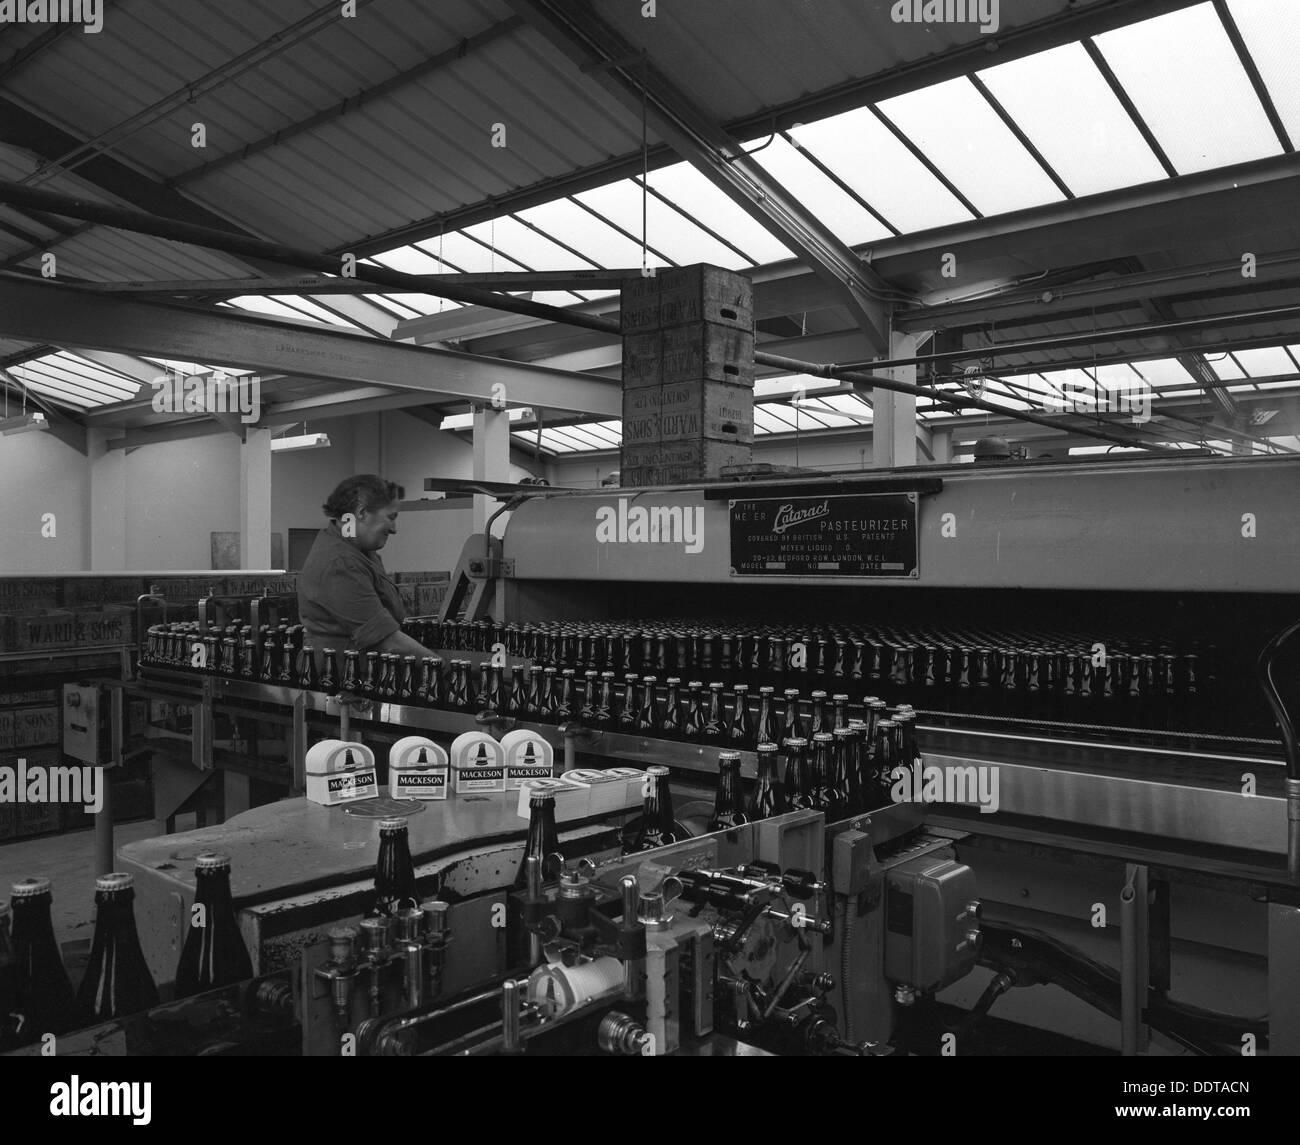 Bottling beer at Ward & Sons bottling plant, Swinton, South Yorkshire, 1961. Artist: Michael Walters - Stock Image